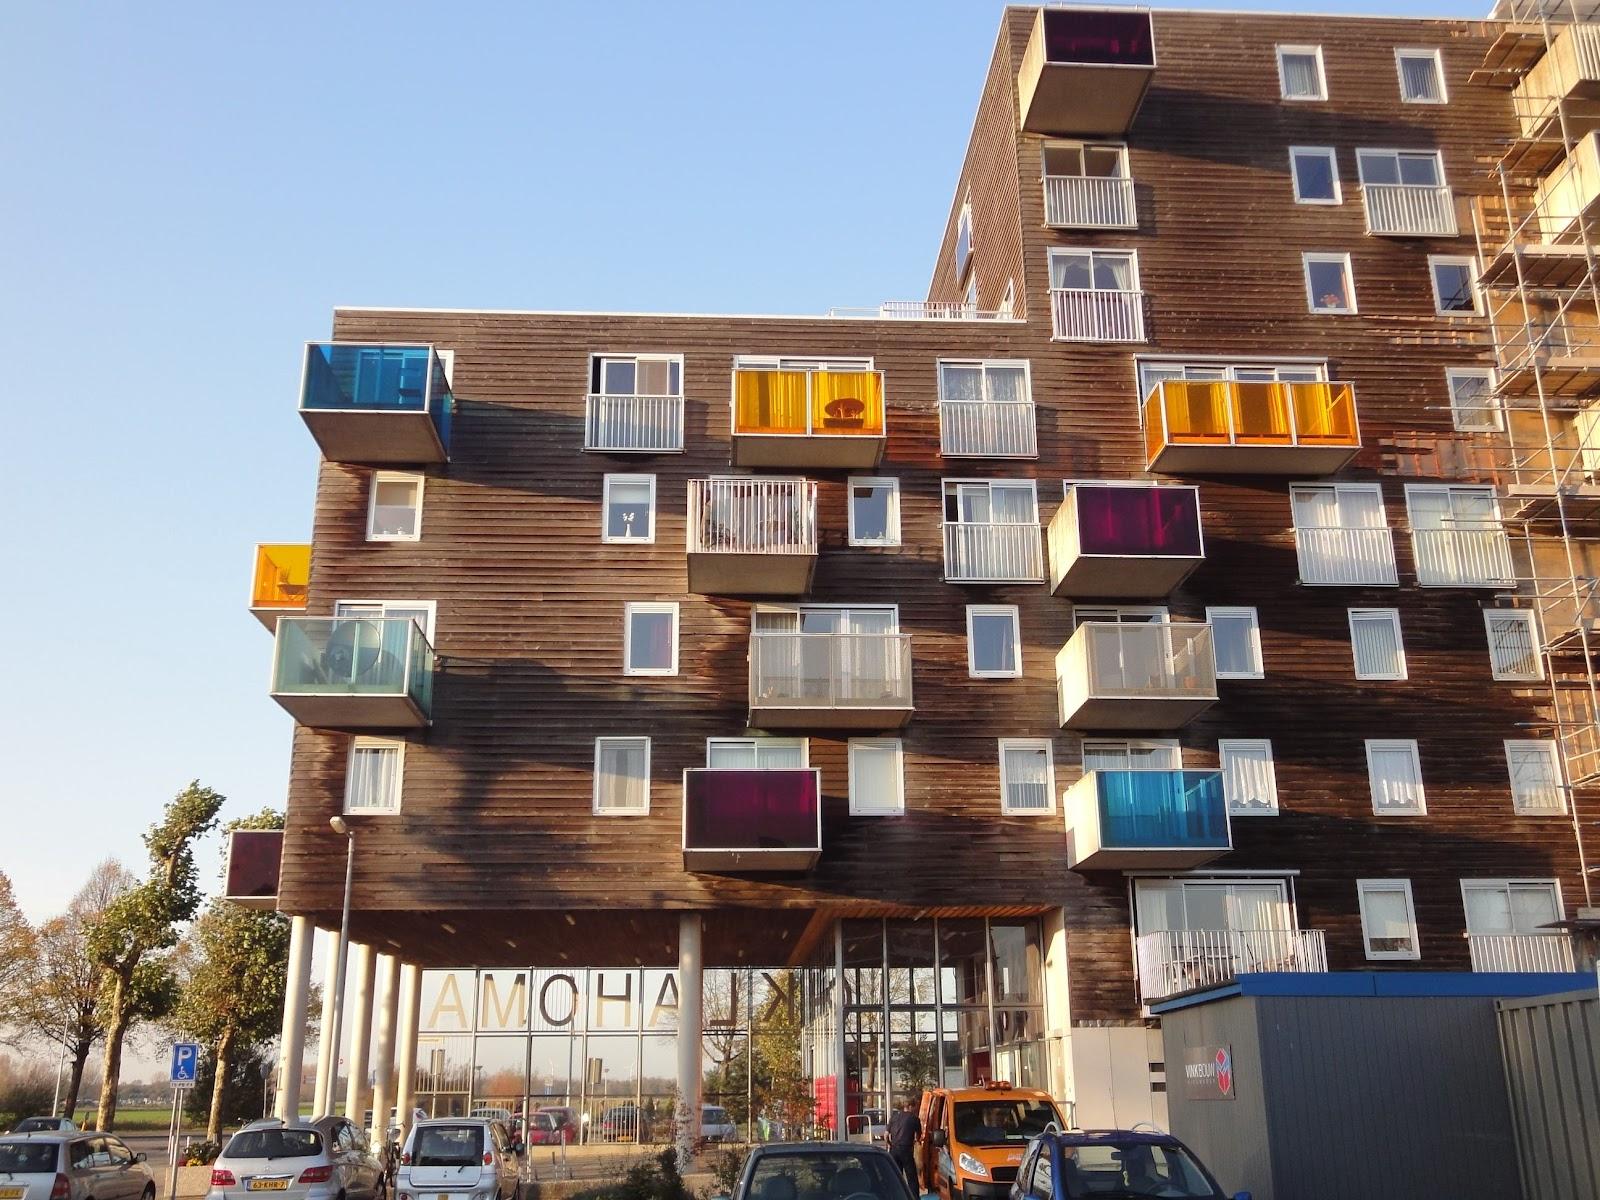 scostumista modern architecture in amsterdam 1 On architect amsterdam